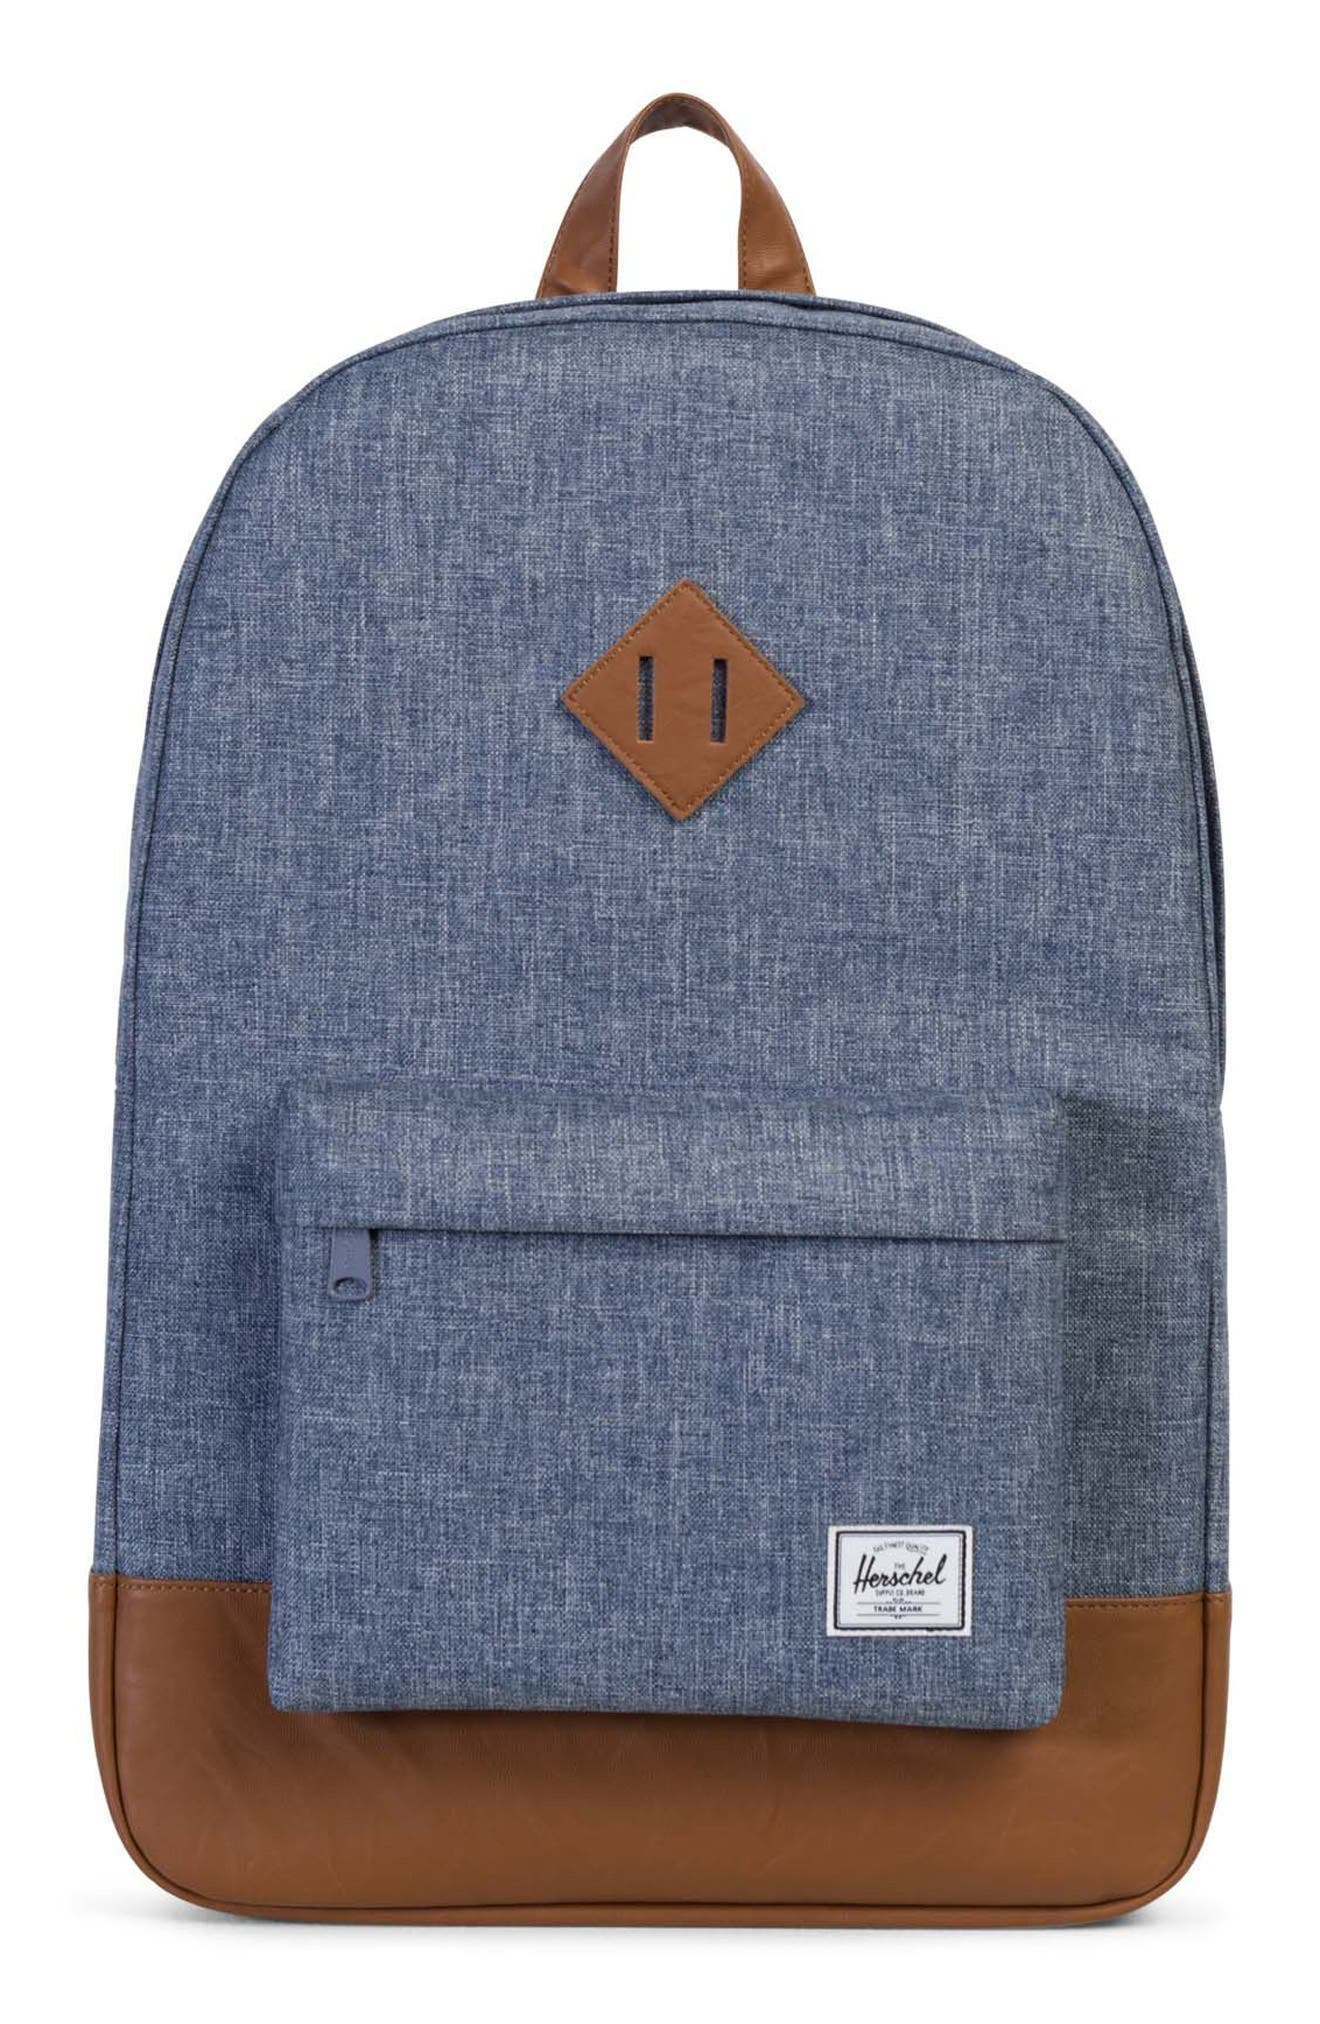 Heritage Backpack,                         Main,                         color, Dark Blue Crosshatch/ Tan